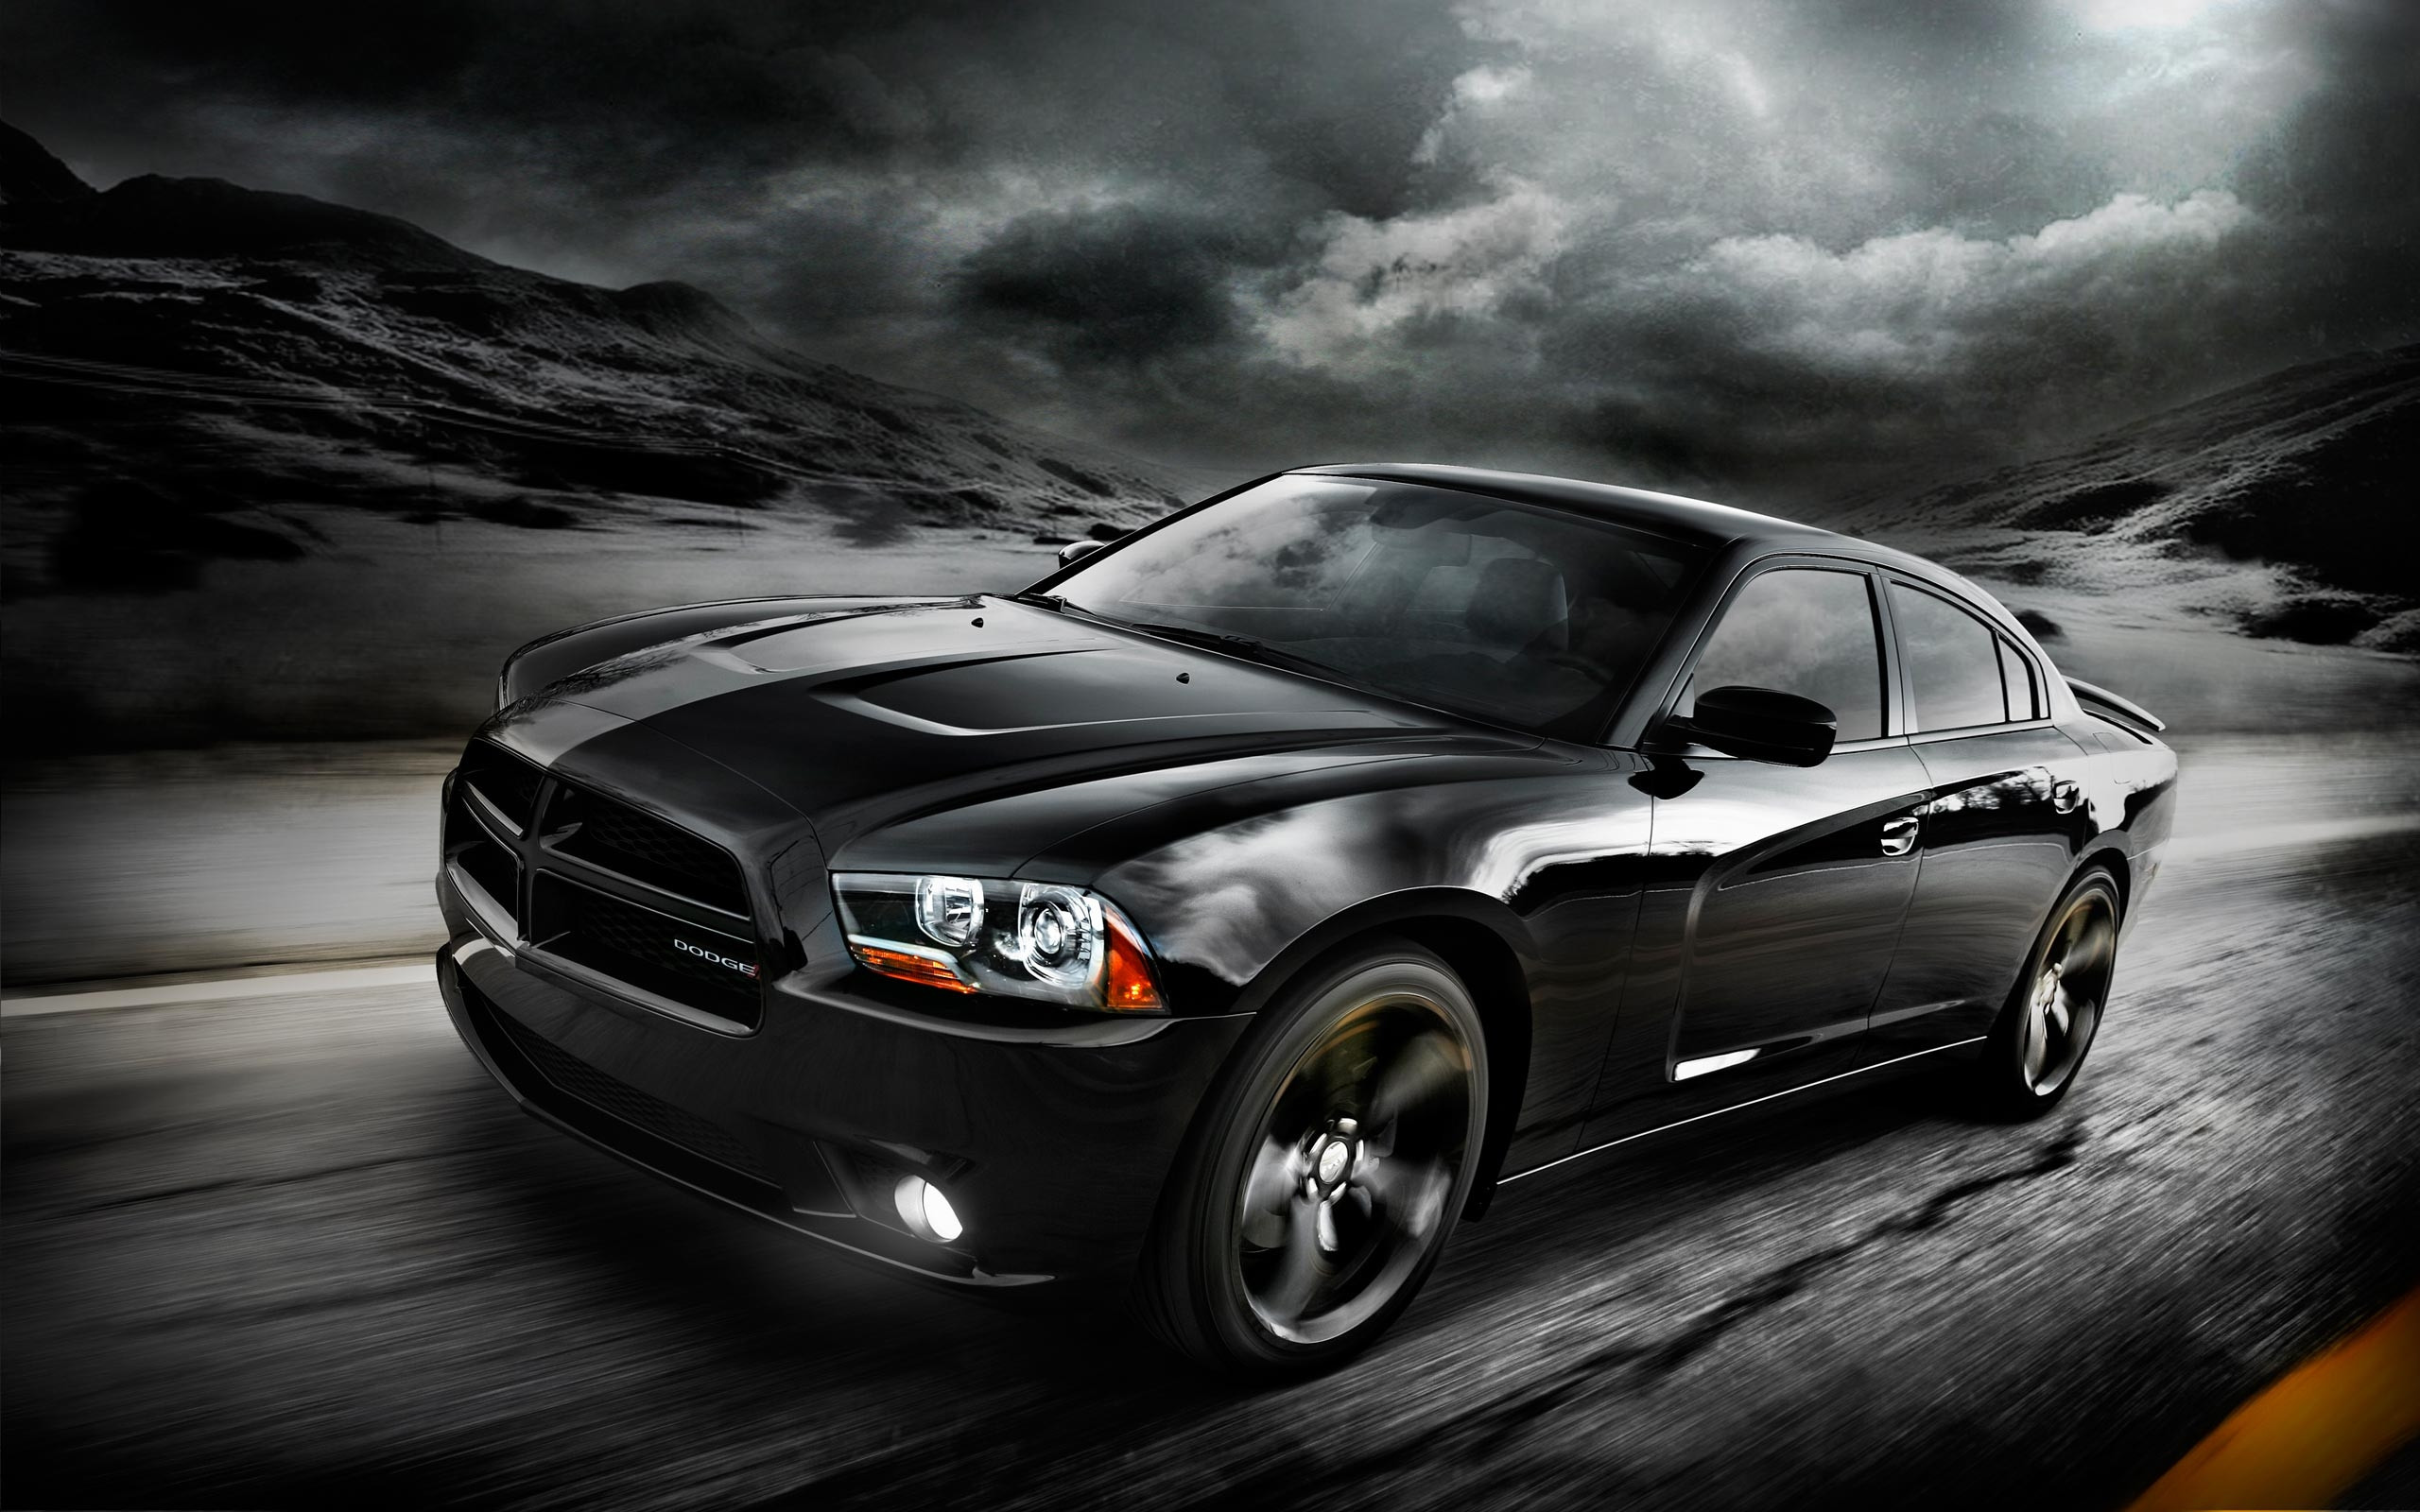 65 Dodge Challenger Black Hellcat